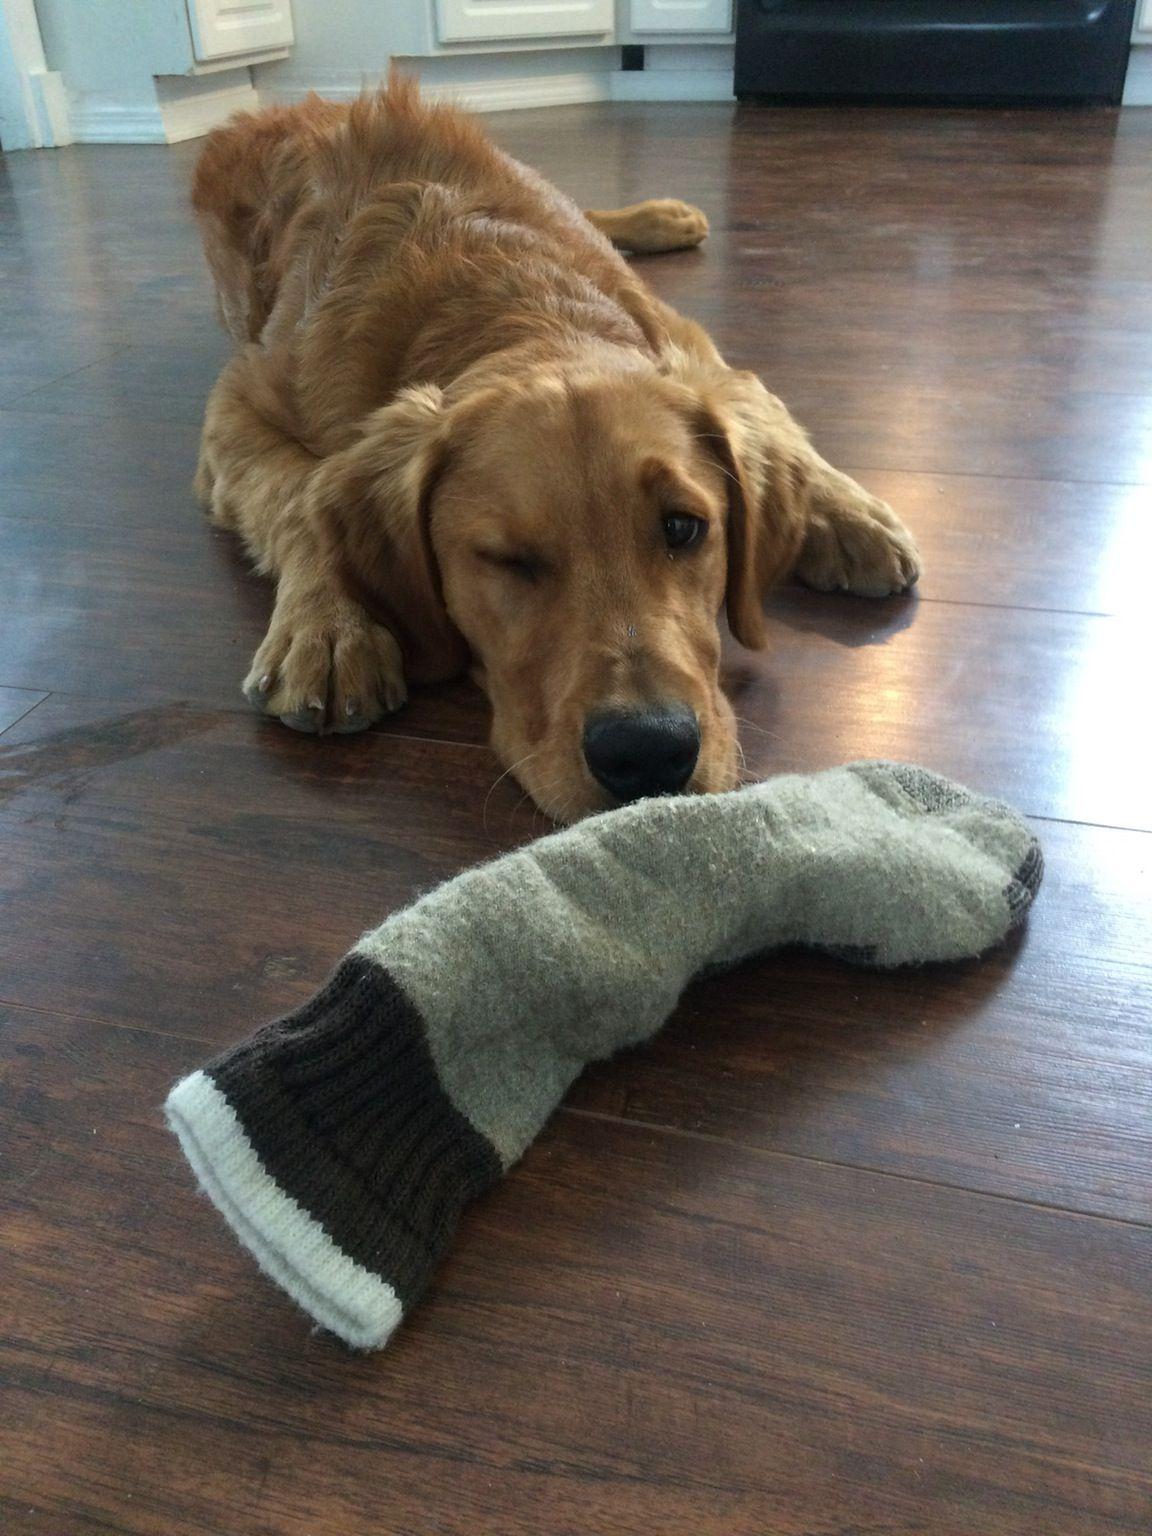 """I won't bite your hand when you reach for the sock."" winks http://ift.tt/2eimMAL"